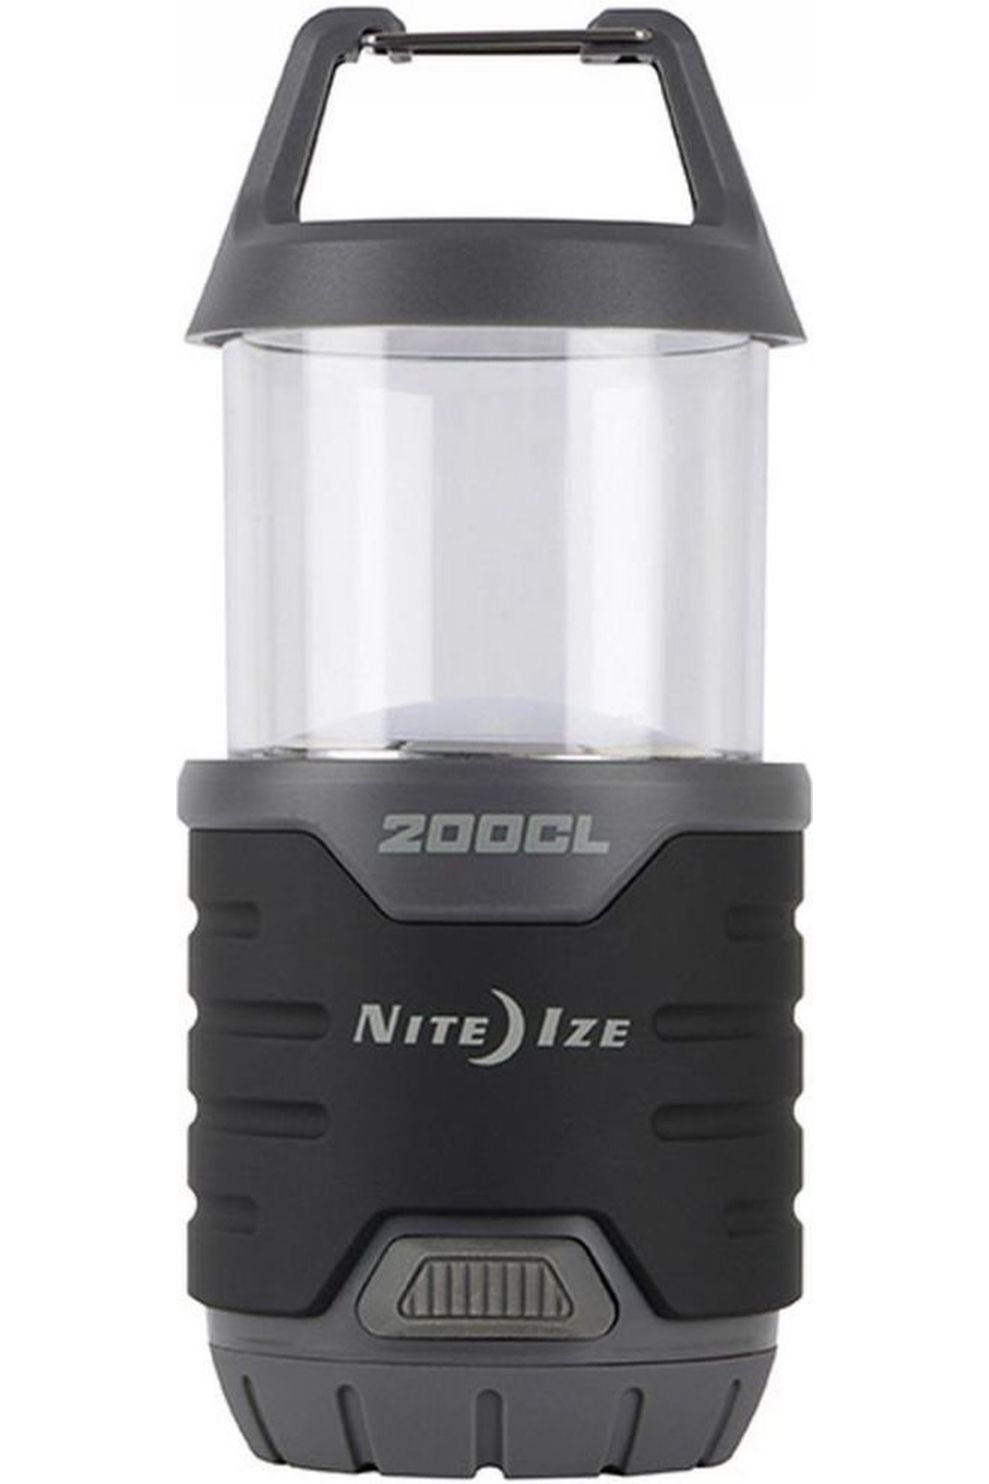 Nite Ize Verlichting Radiant 200 Collapsible Lantern + Flashlight - - Transparant